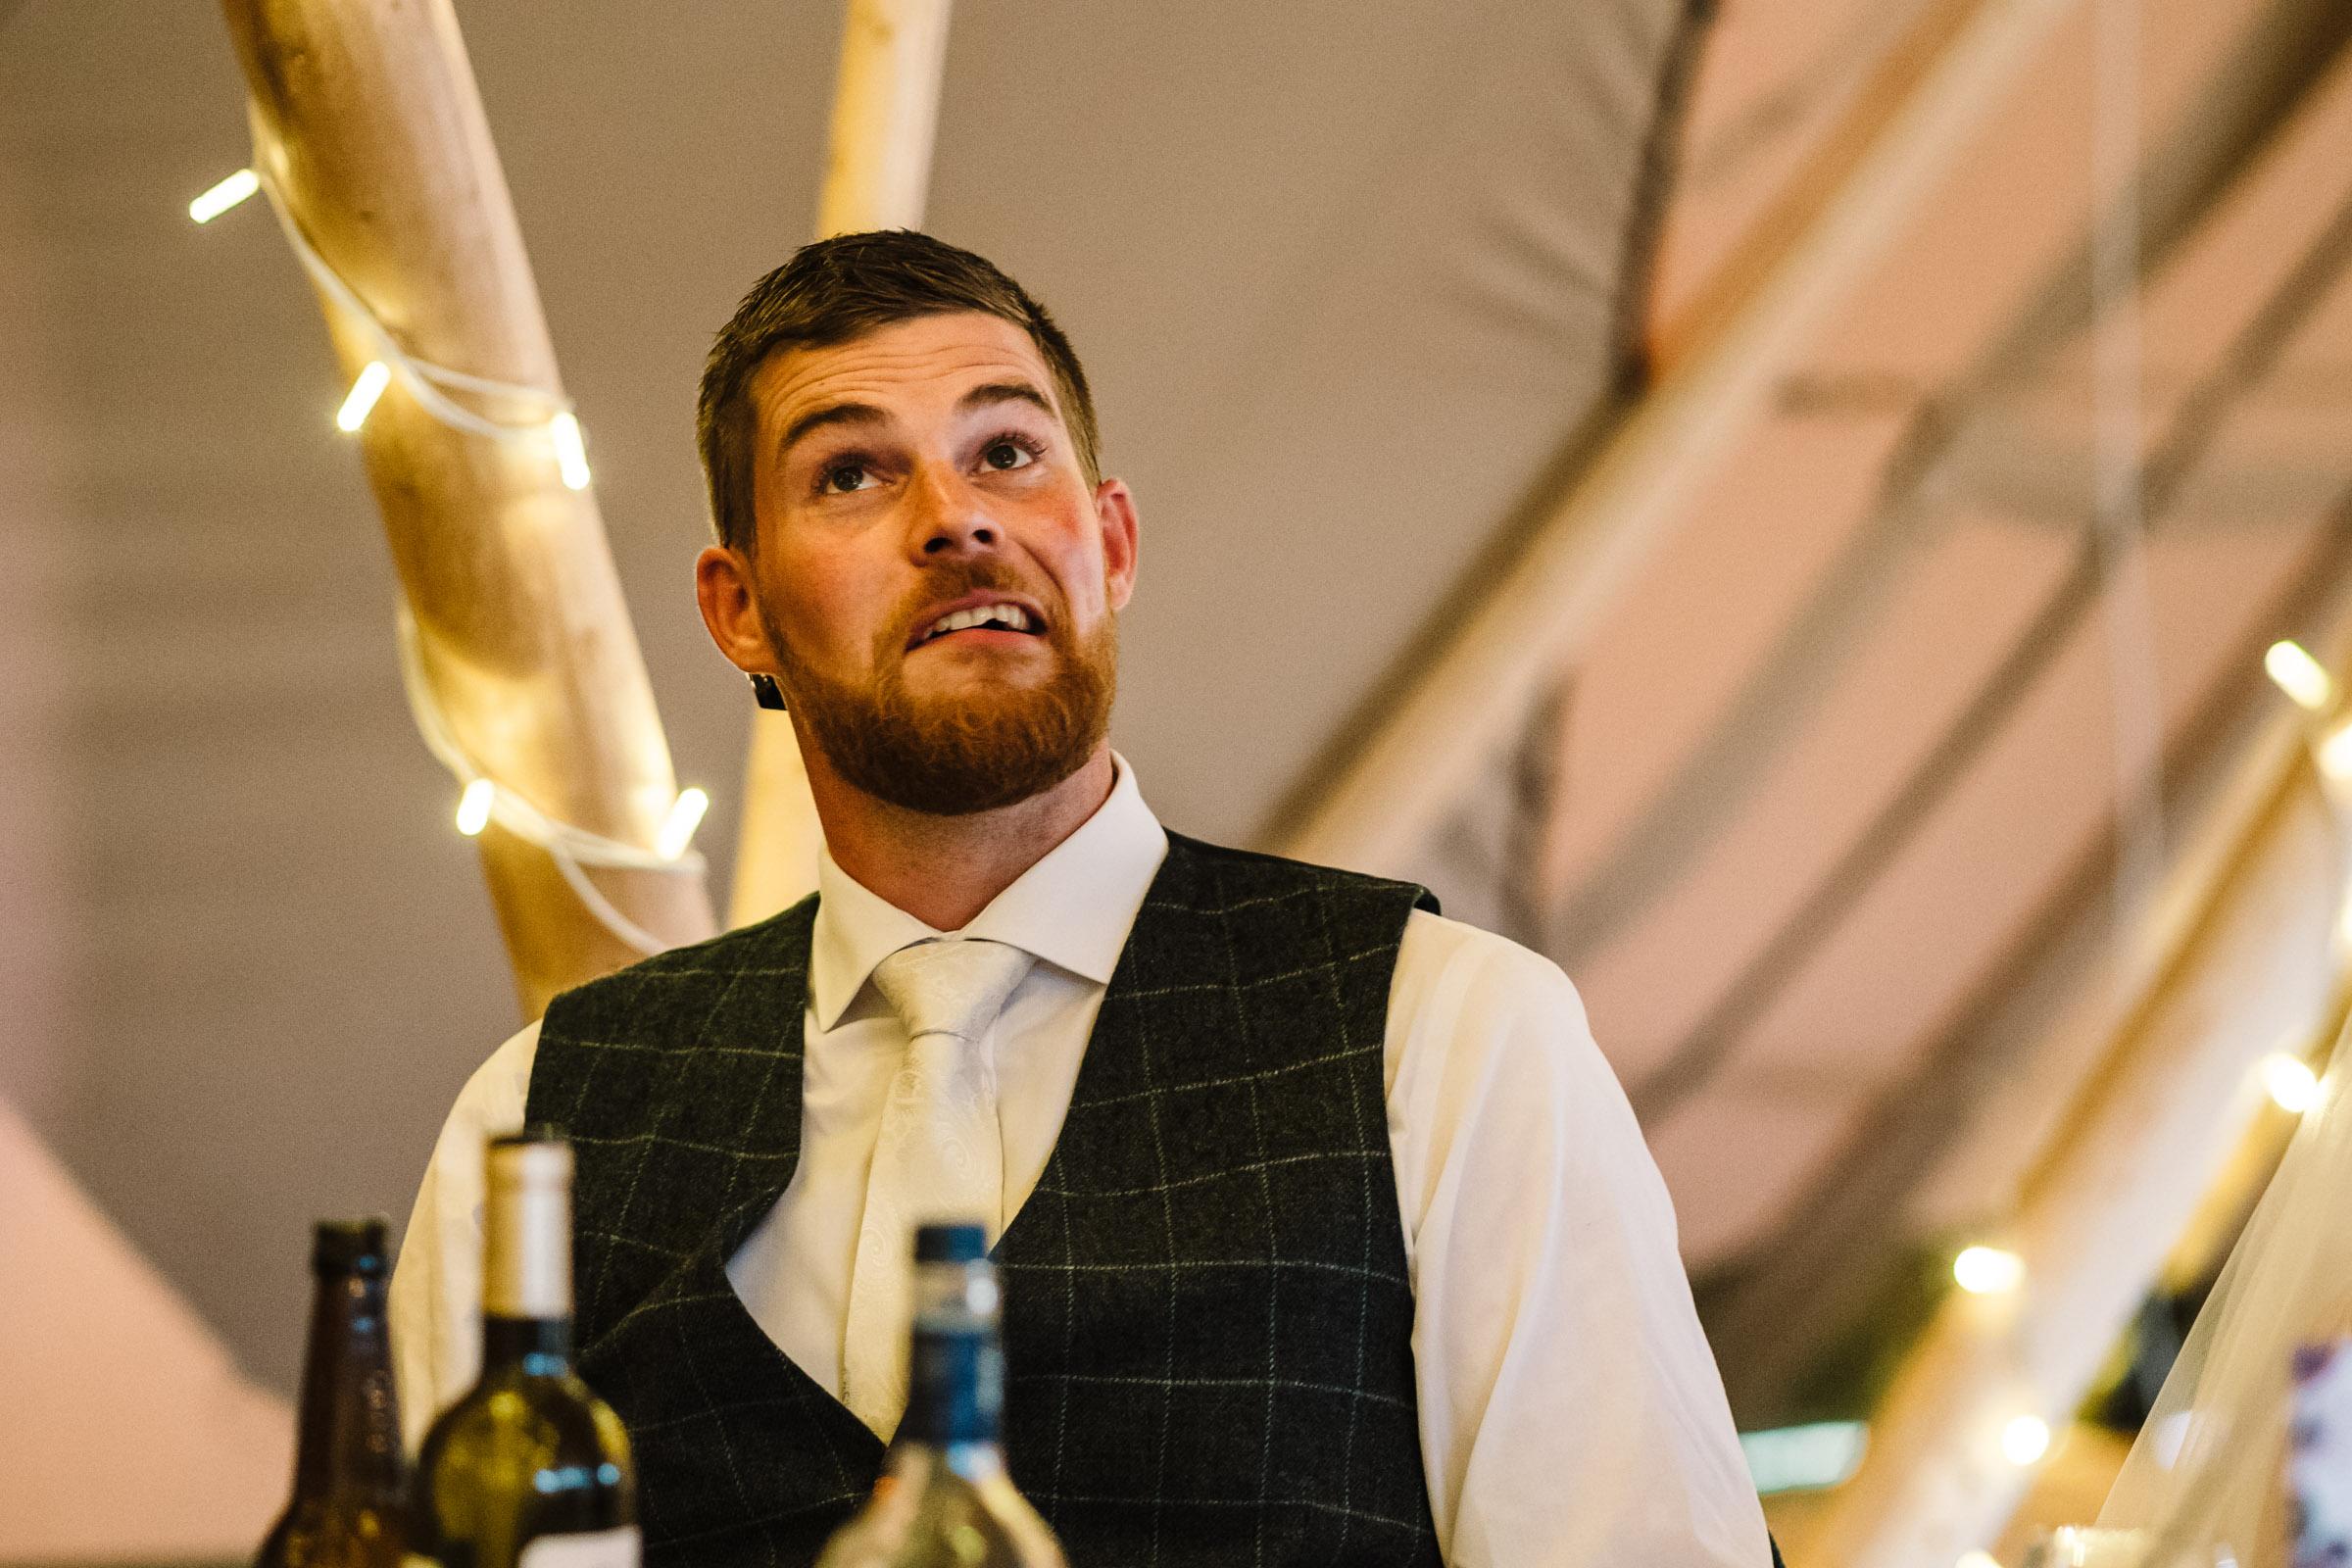 groom pulling funny face during wedding speech